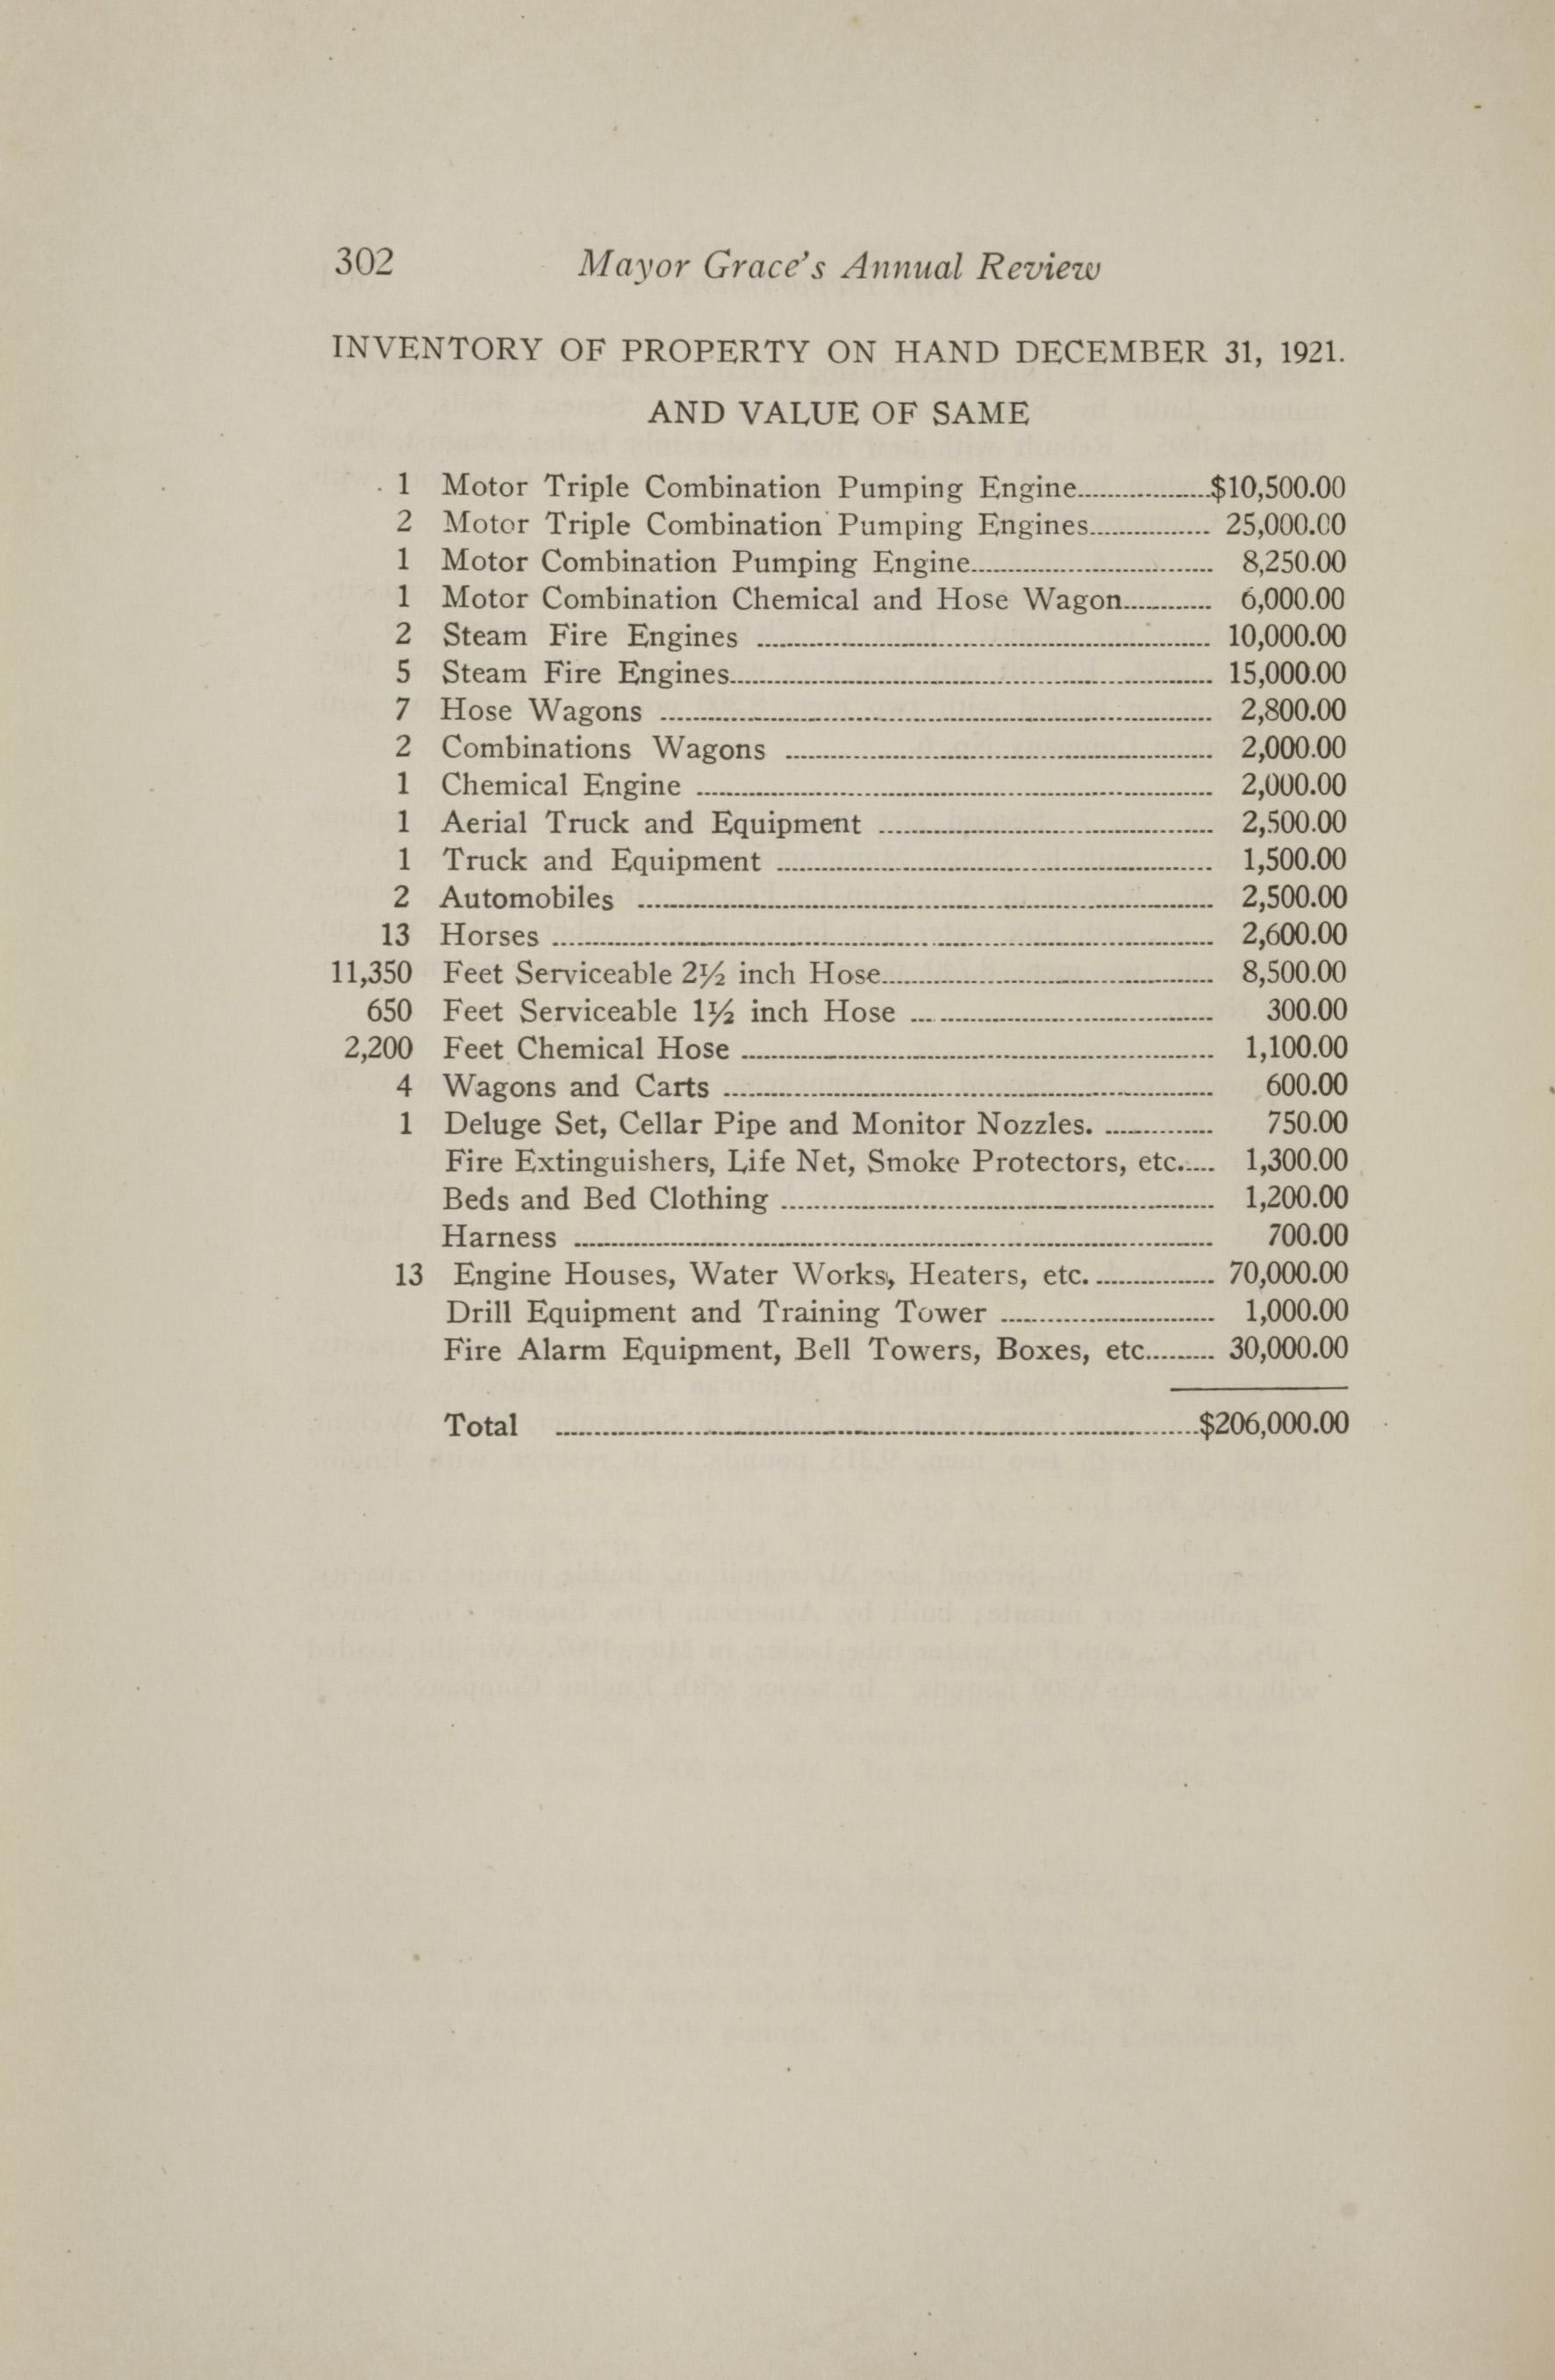 Charleston Yearbook, 1921, page 302